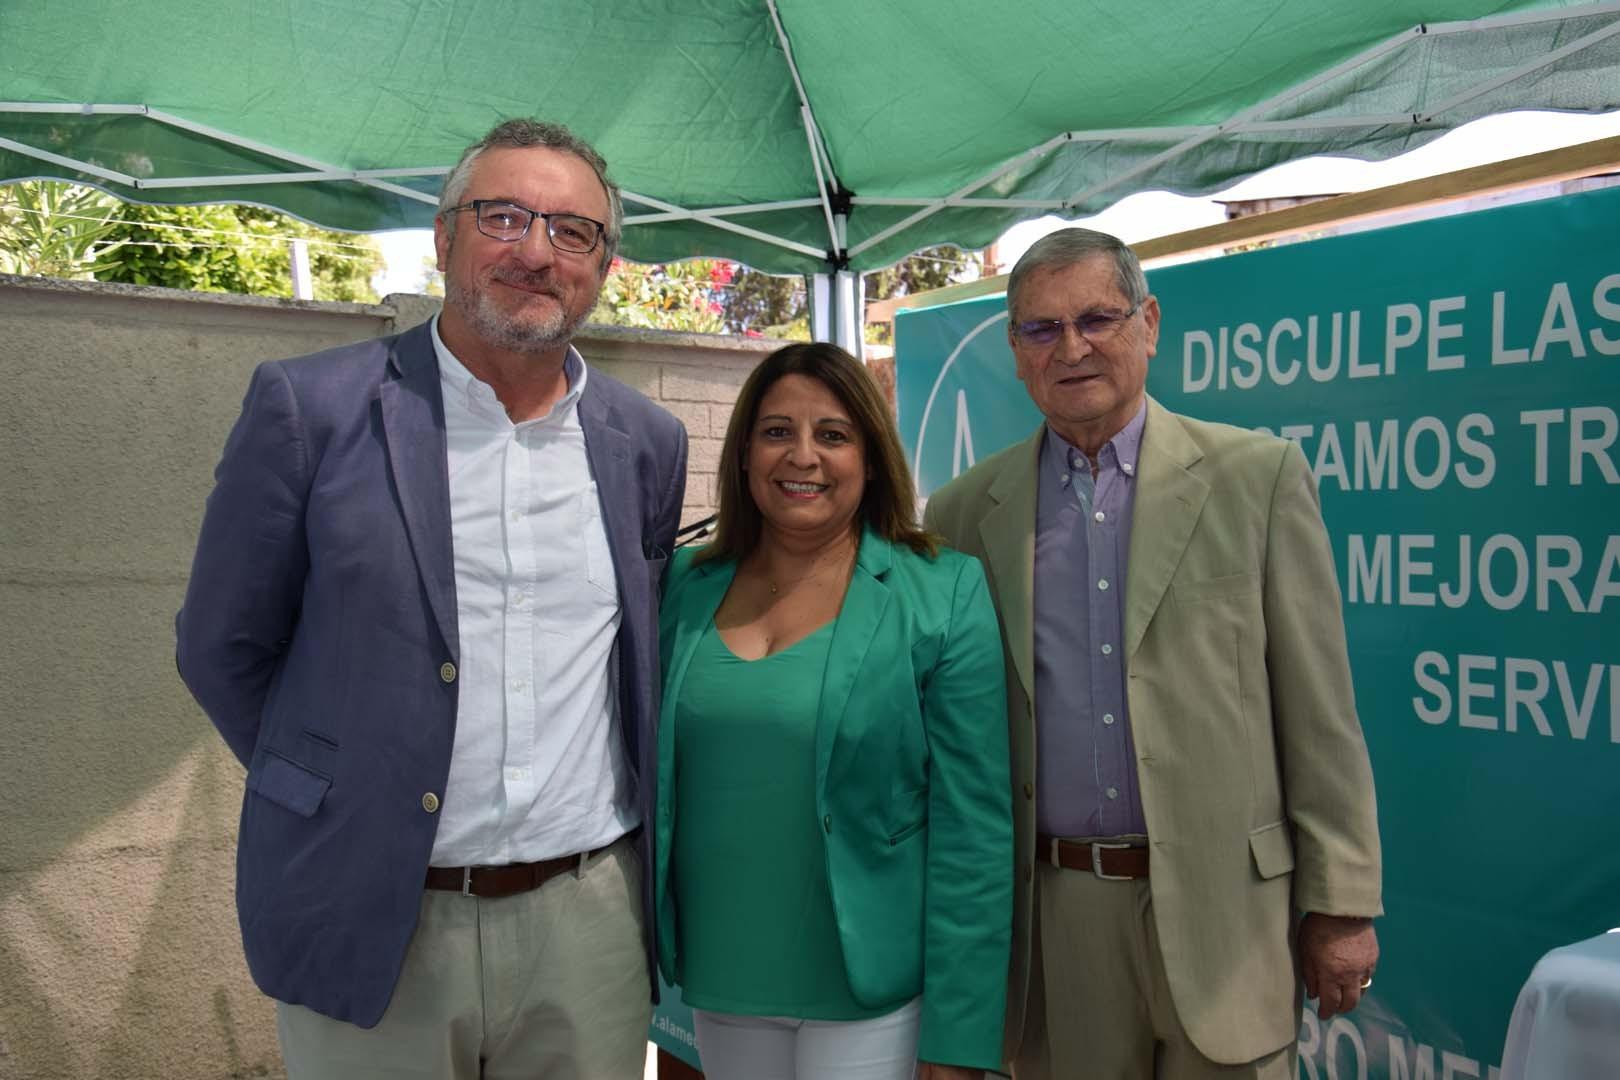 Richard Sepúlveda, Carmen Fuentes y Víctor Sepúlveda